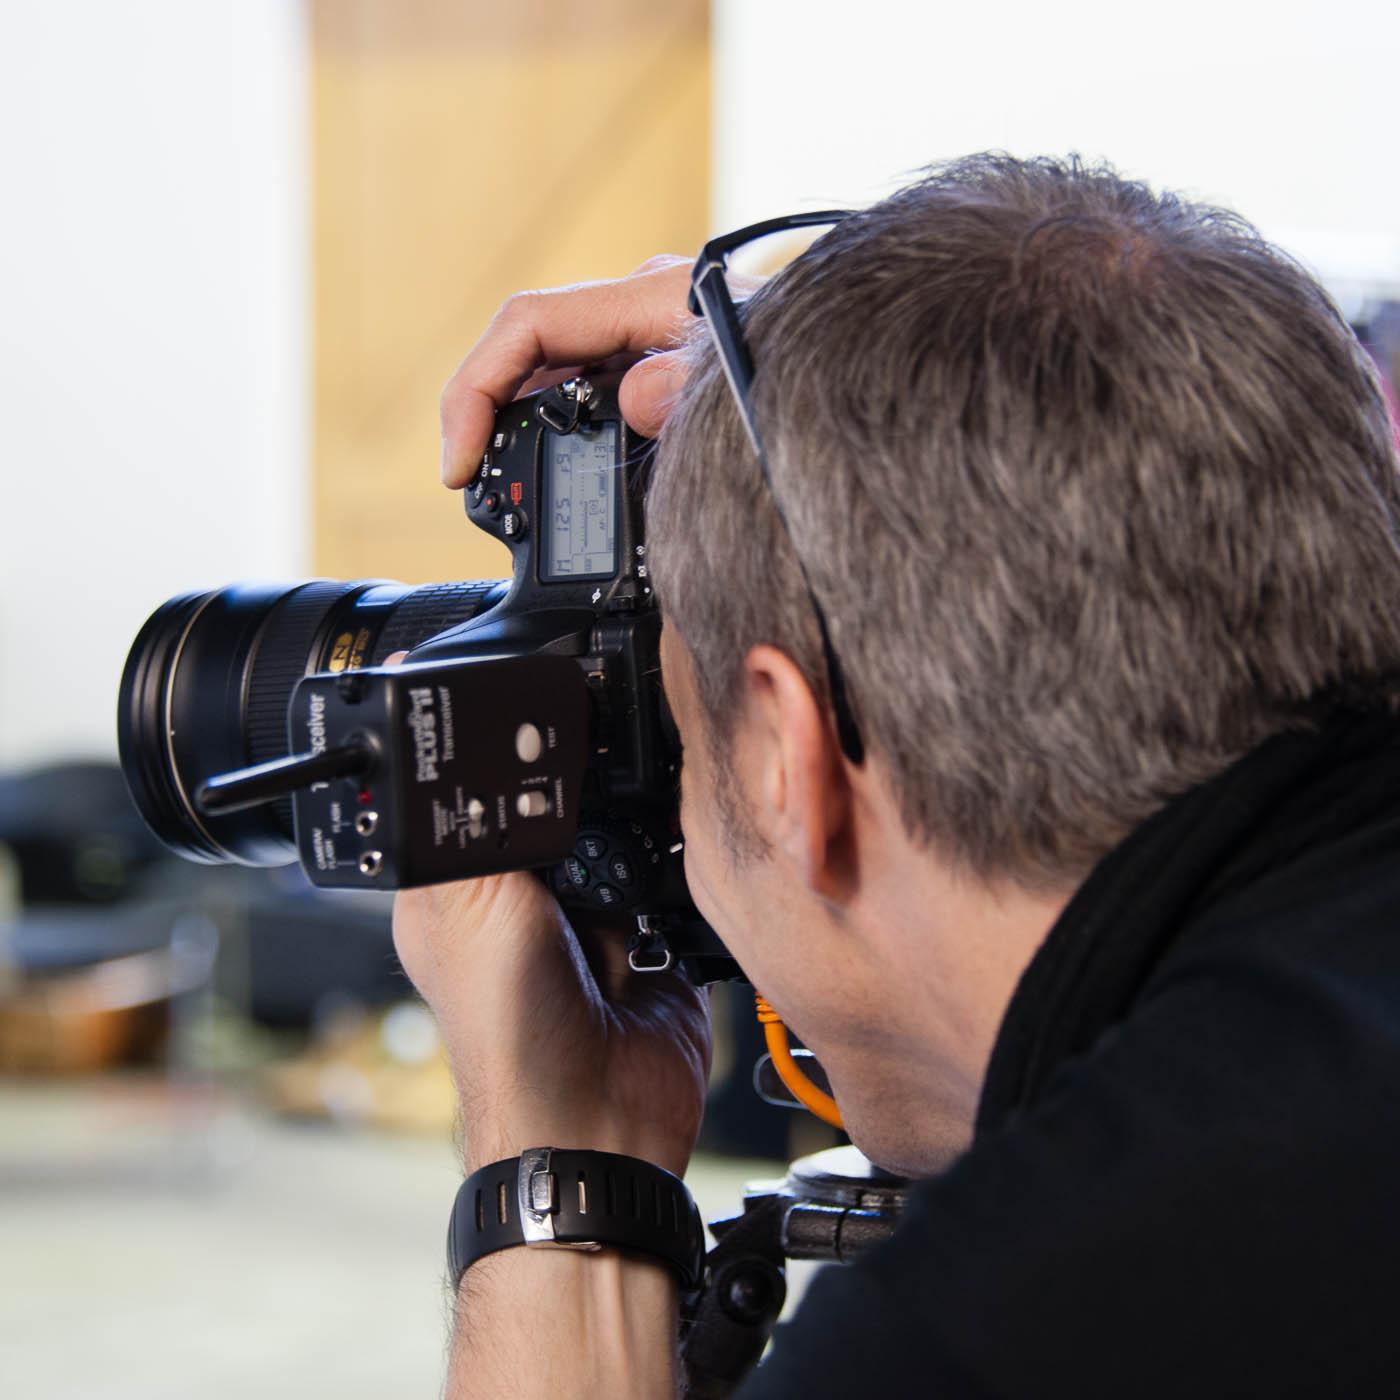 Behind the scenes at studio shoot 12